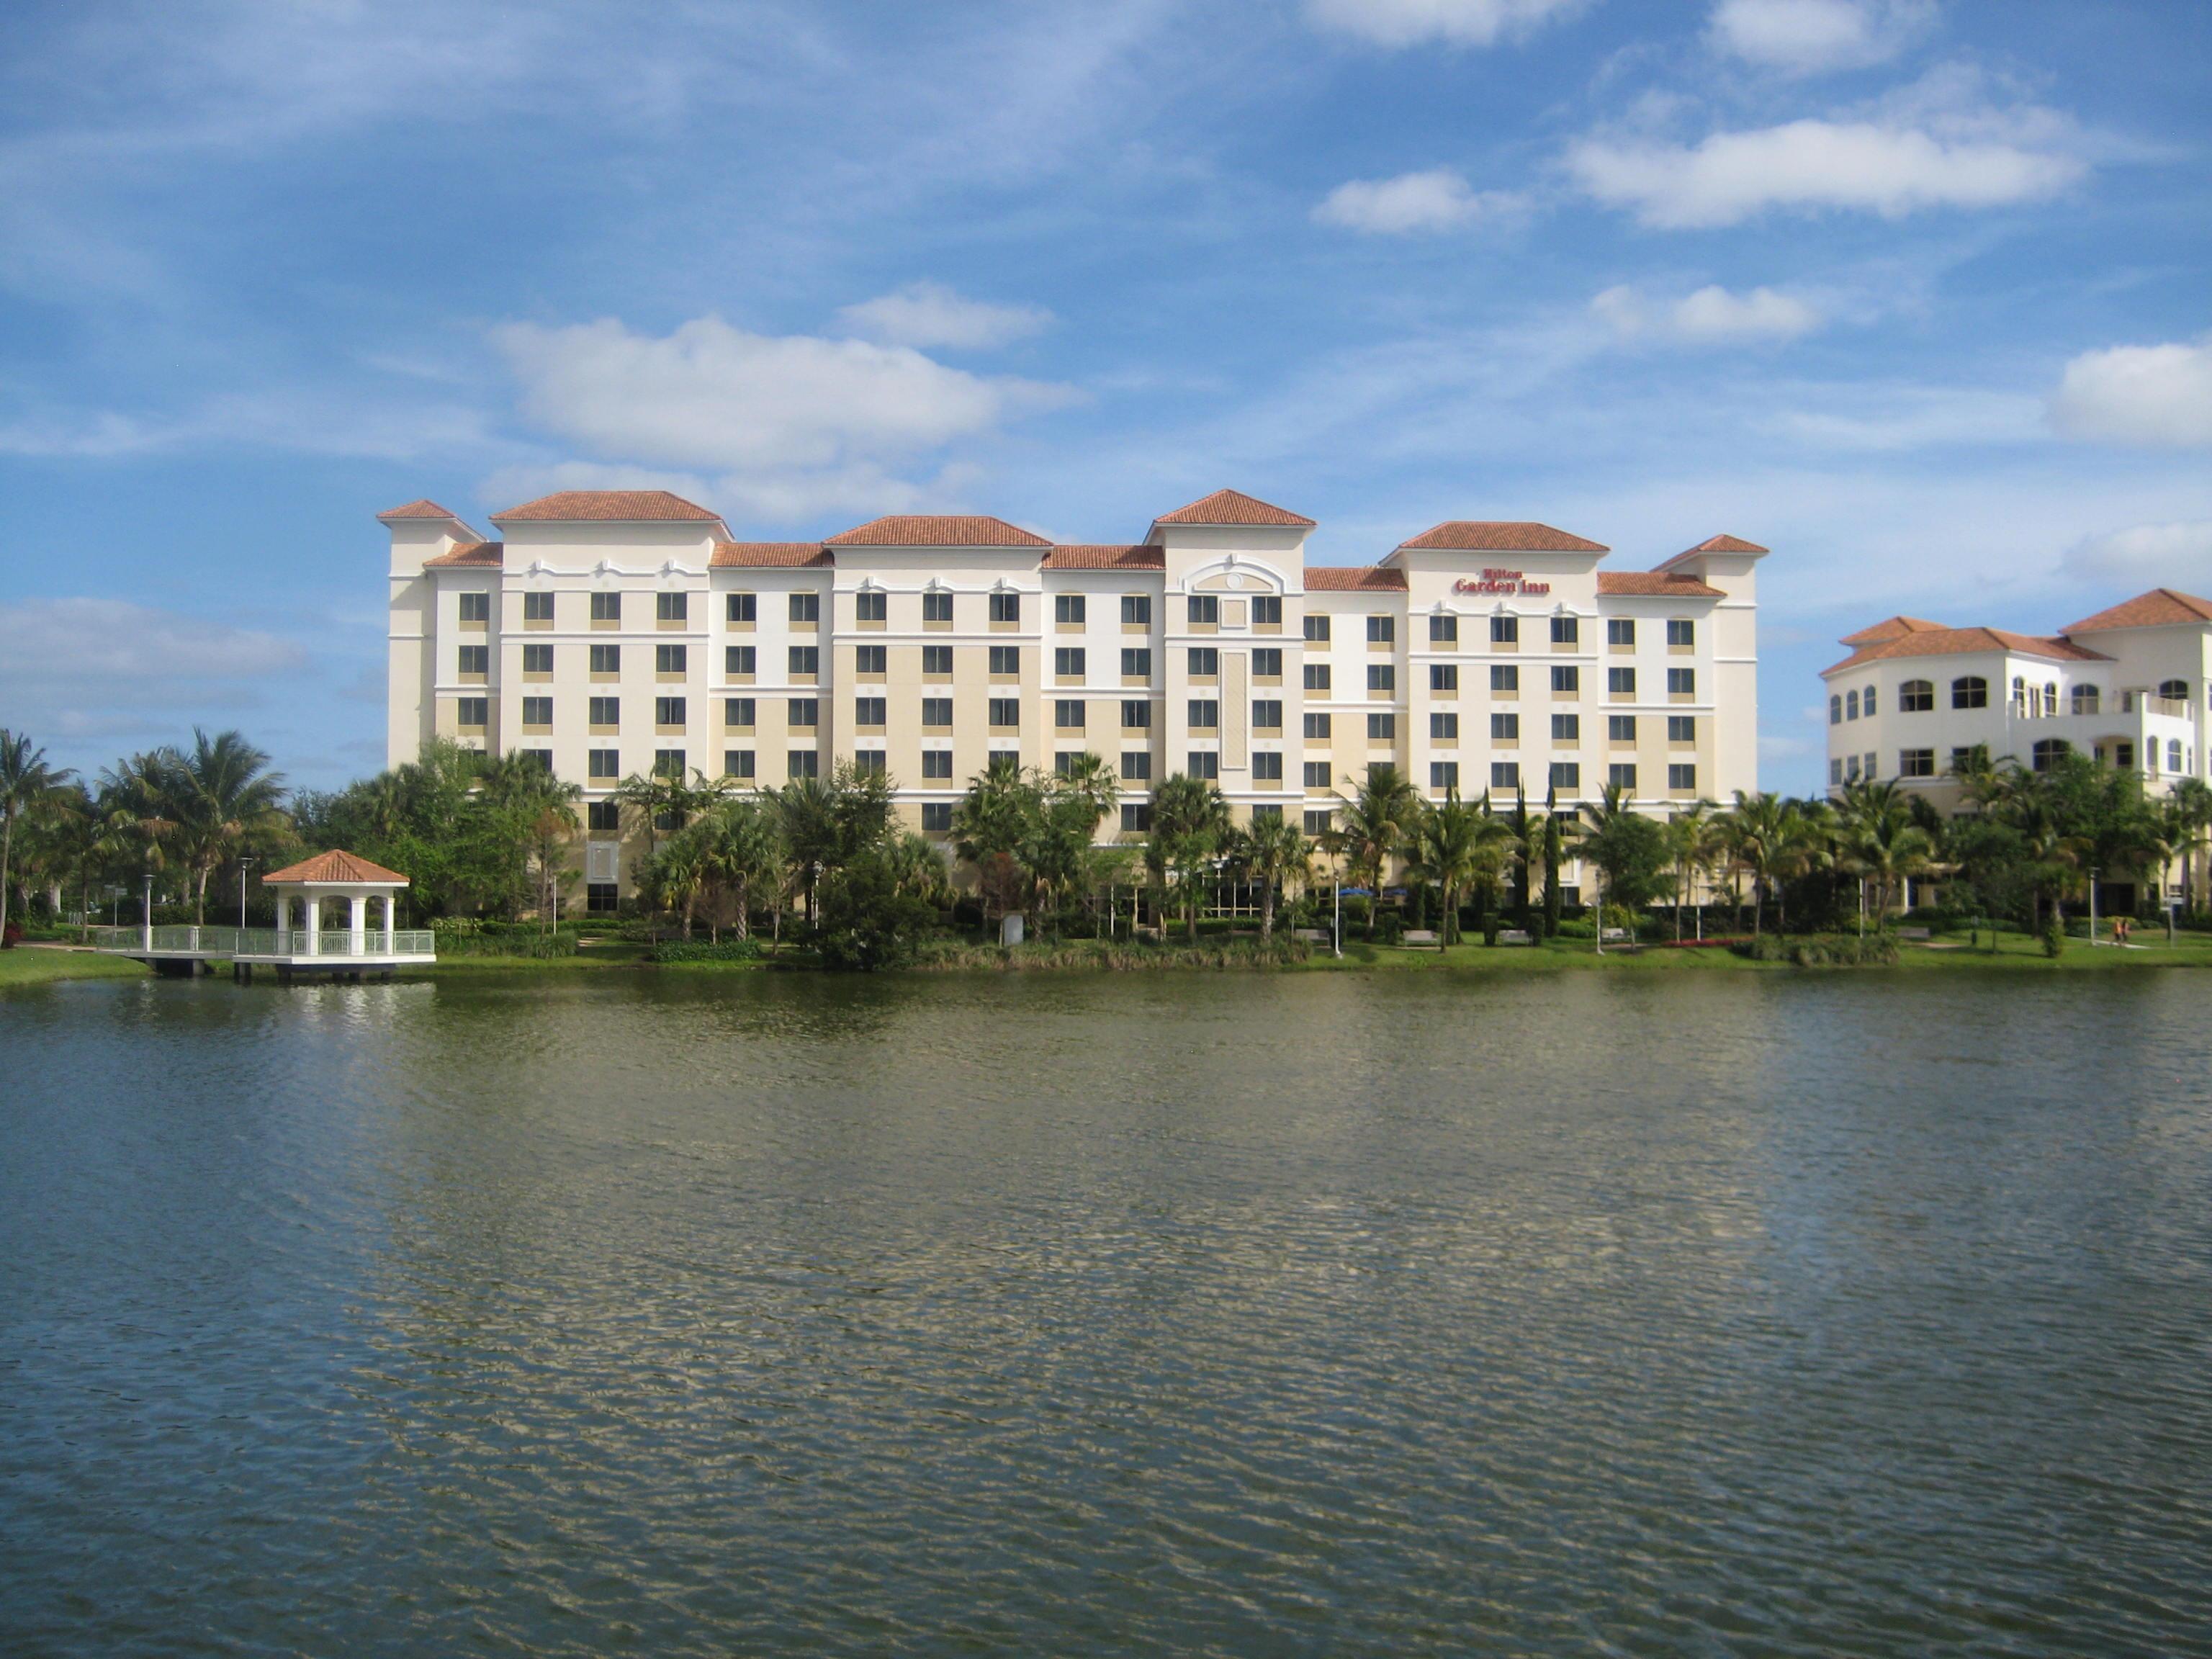 Hilton Garden Inn Palm Beach Gardens Fl 2018 Hotel